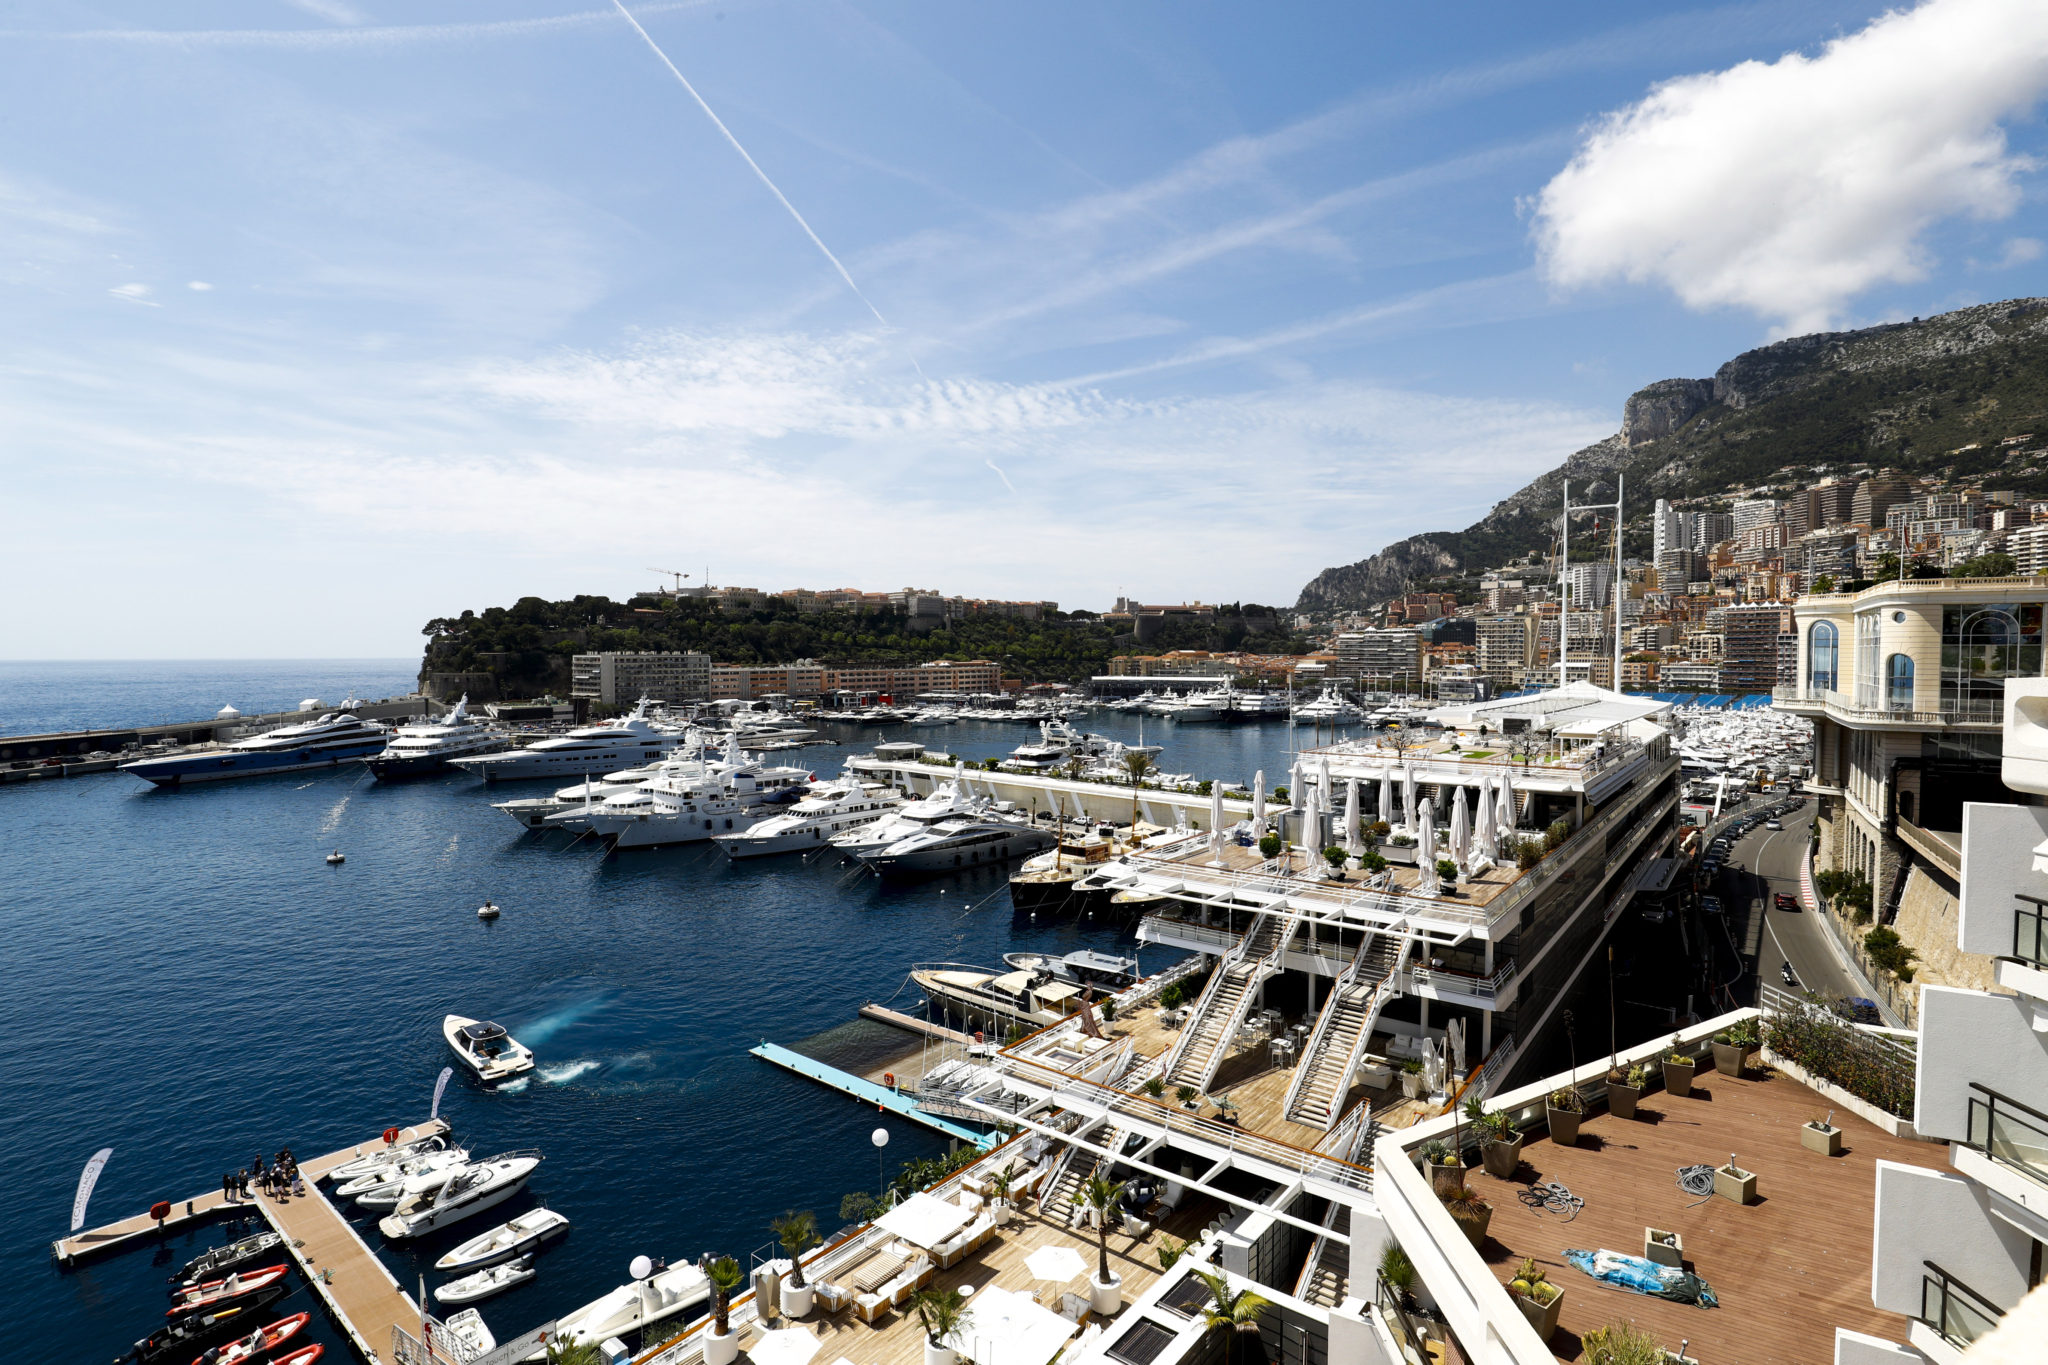 Grand Prix de Monaco - Harbour view